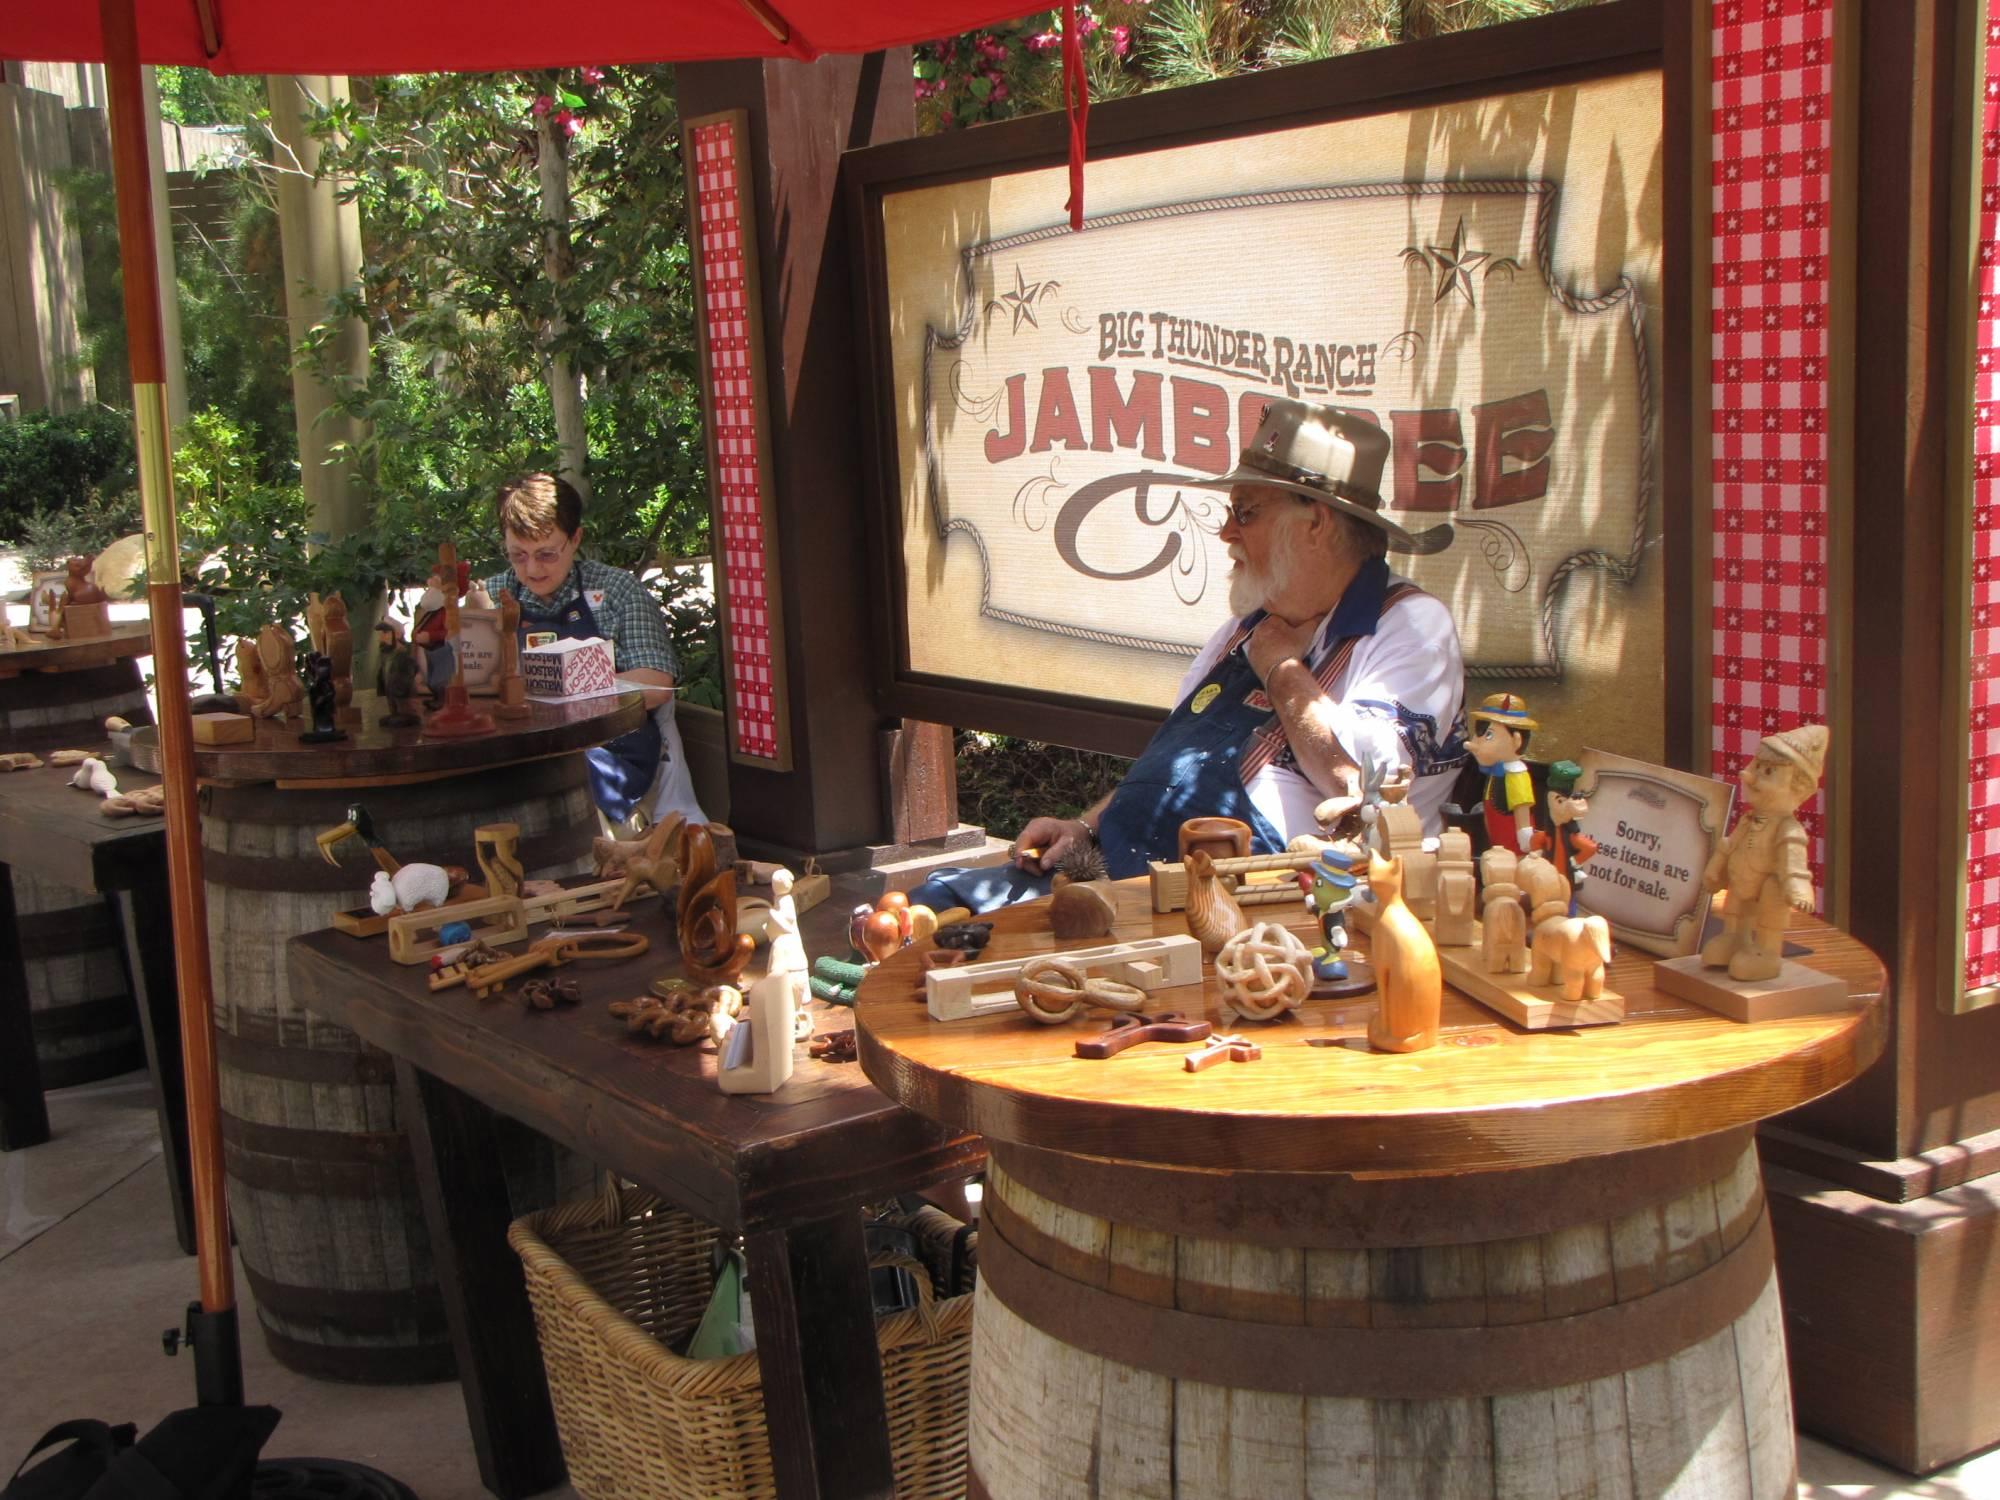 Enjoy character interactions, music, and more at Big Thunder Ranch Festival Area at Disneyland  PassPorter.com